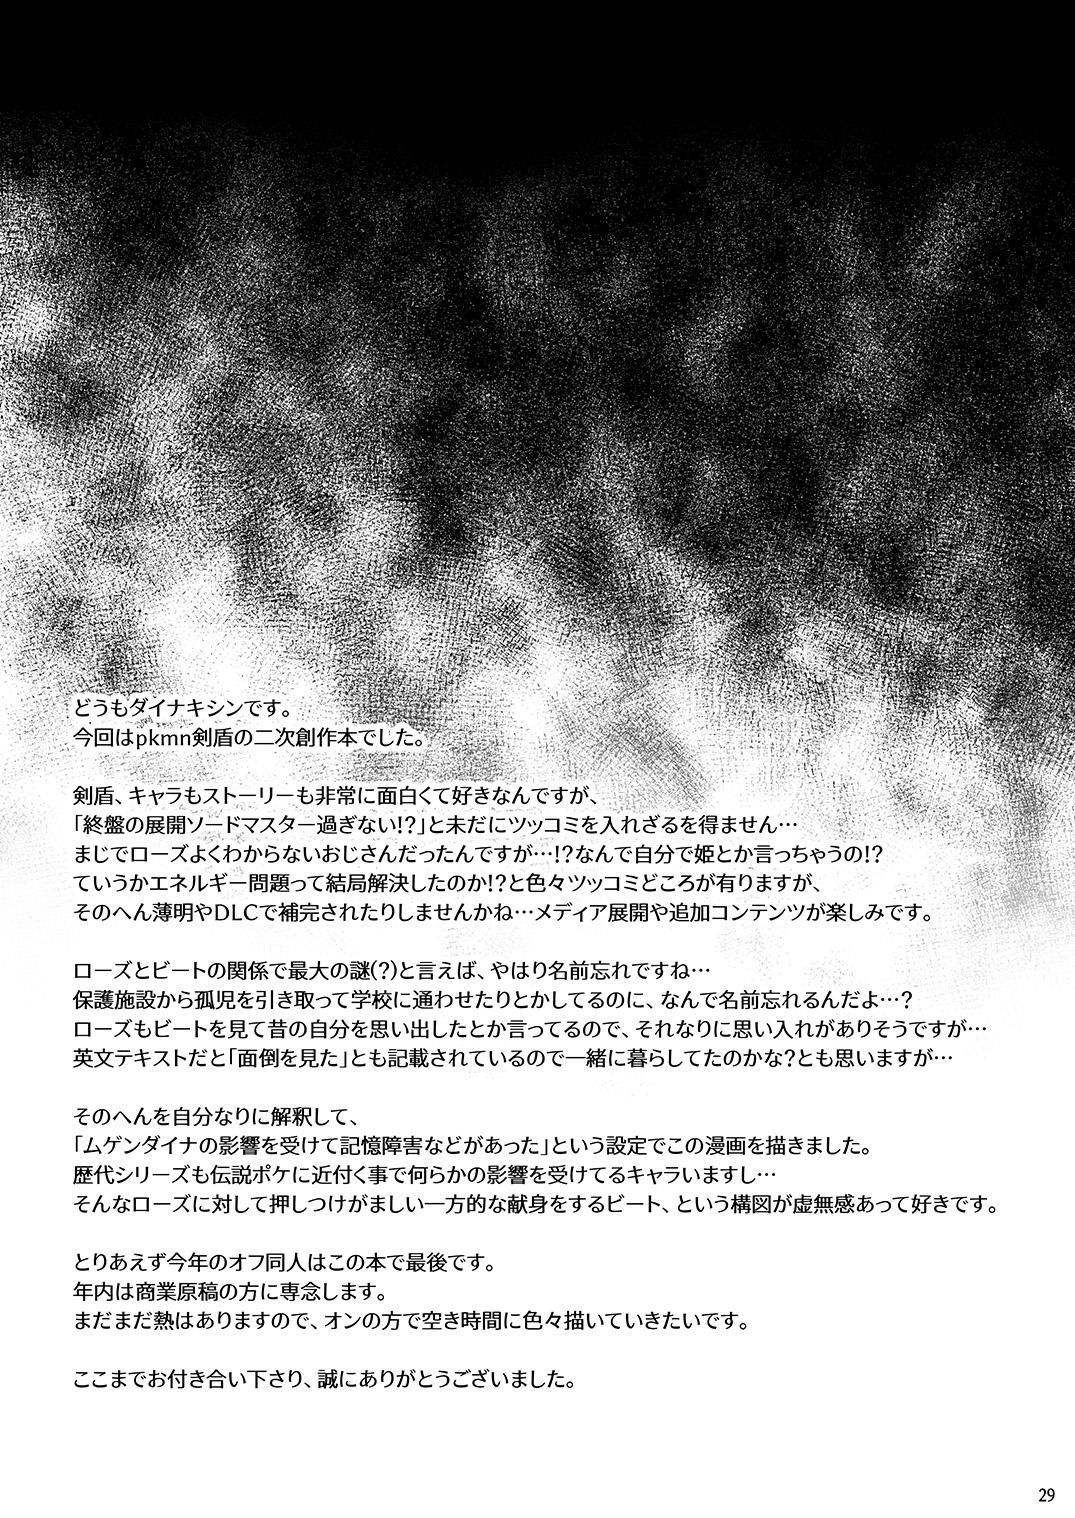 Shounen Beet no Kenshin 28